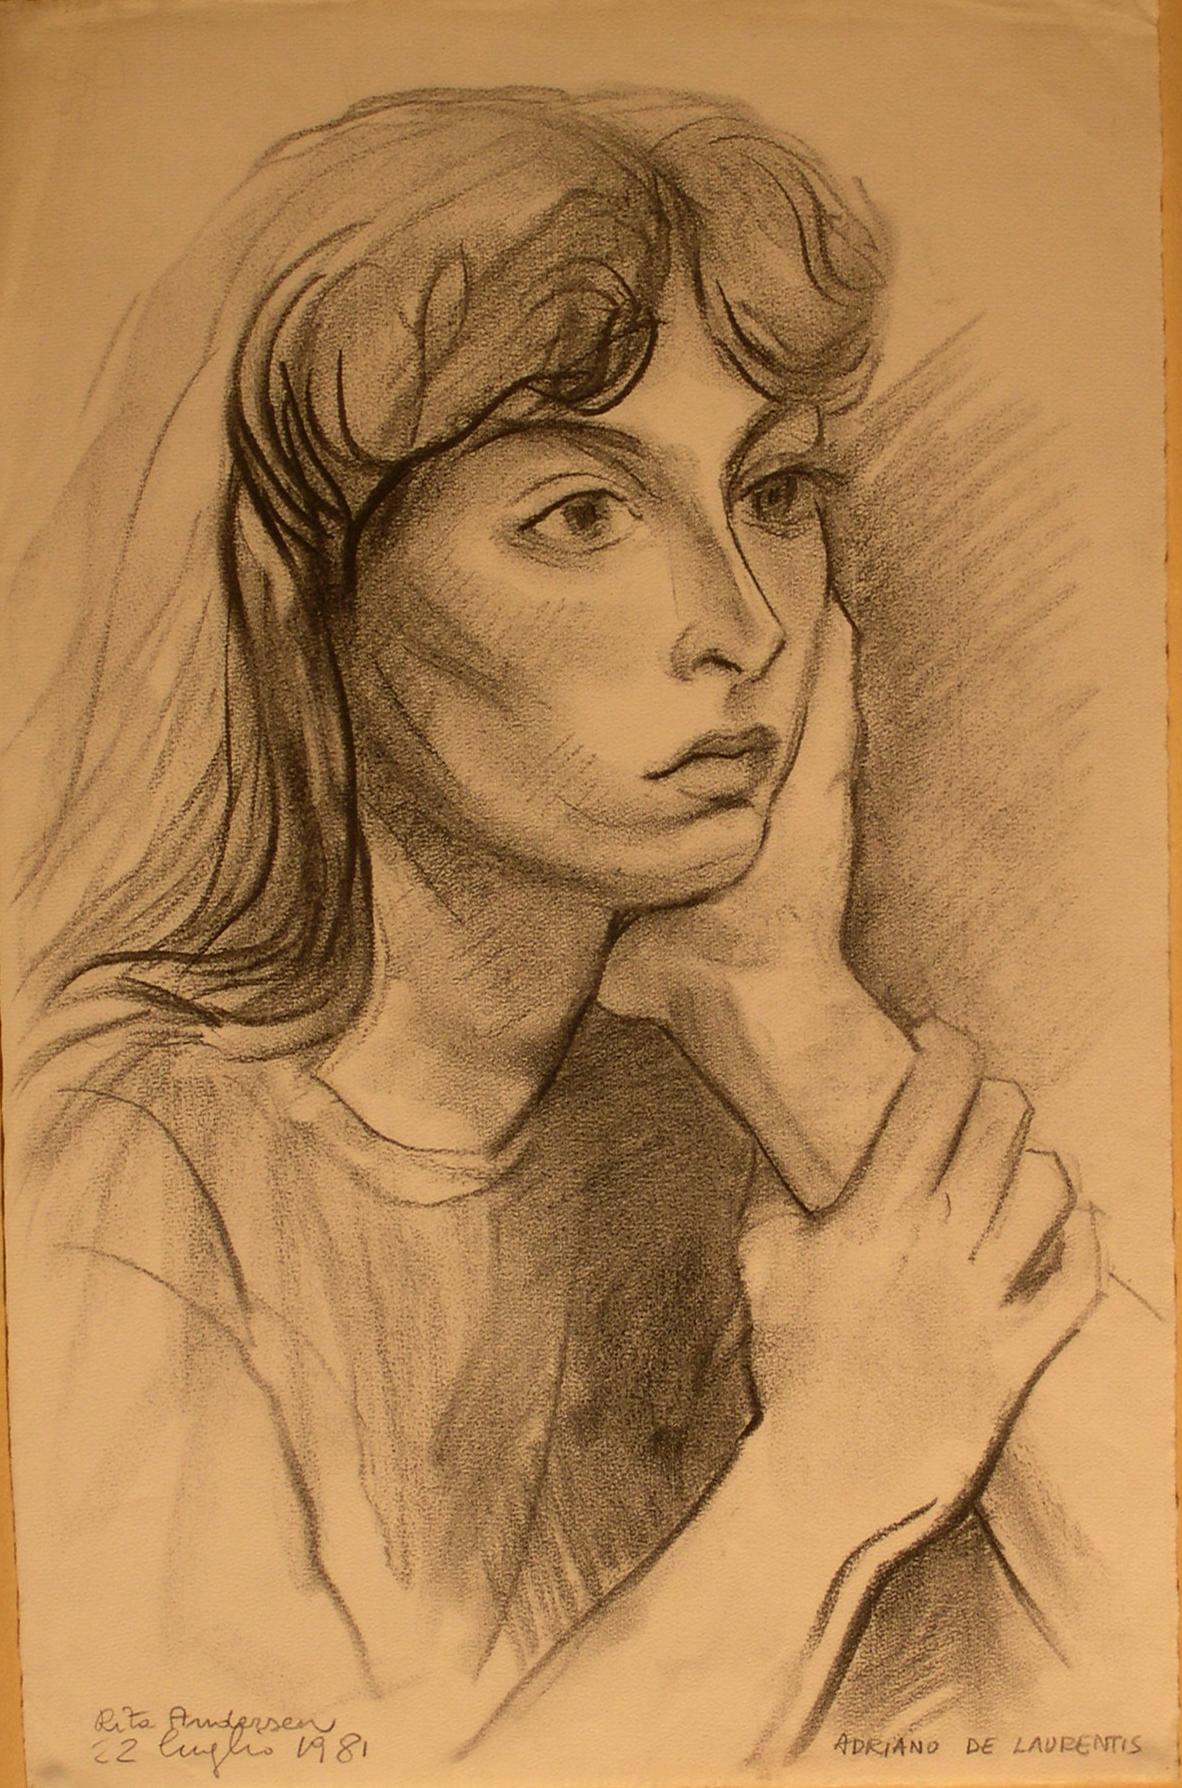 Rita Andersen - Matita su Carta - 48x31 - 1981